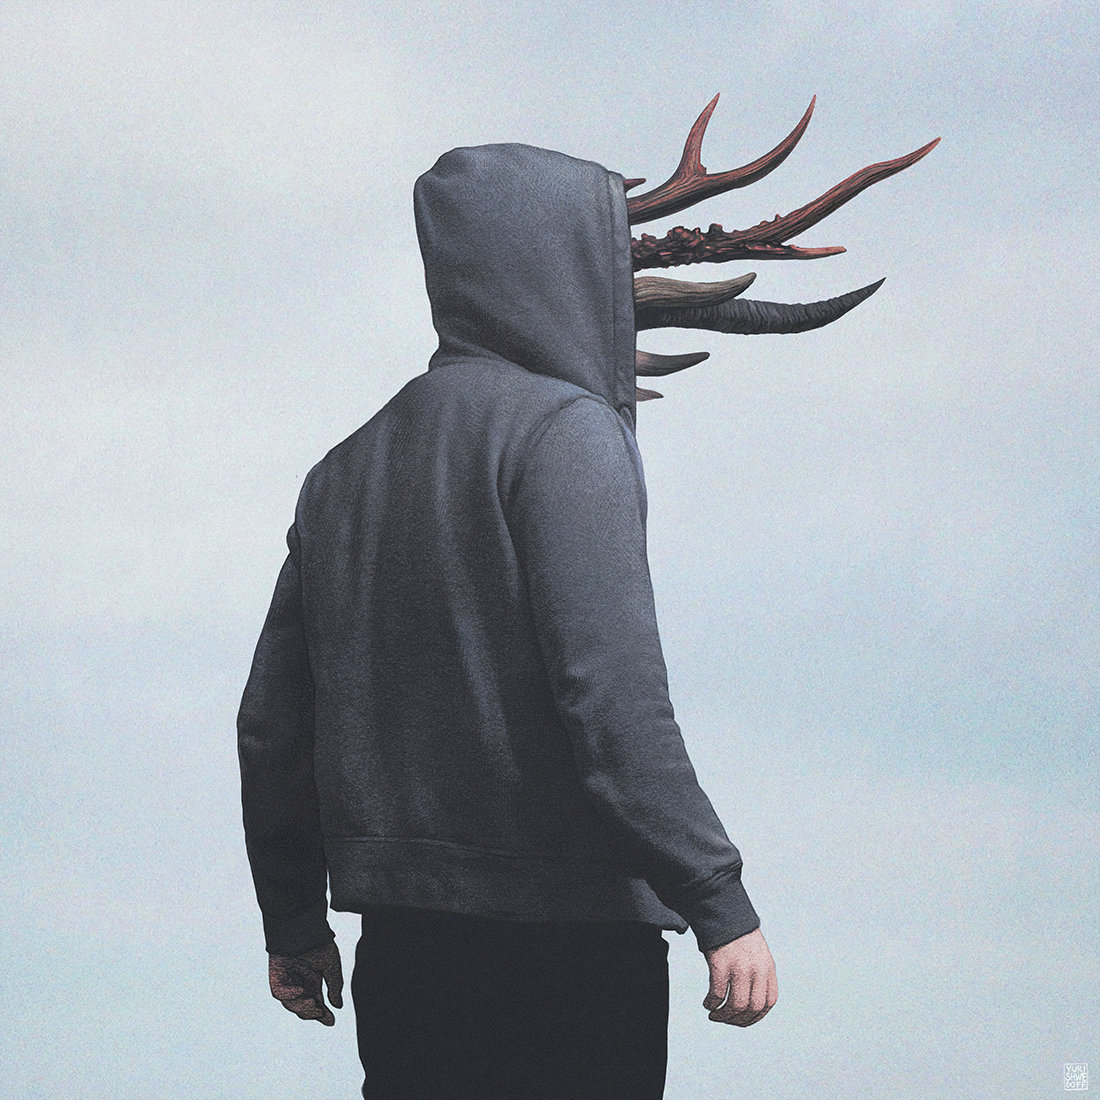 yuri-shwedoff-horns-internet.jpg